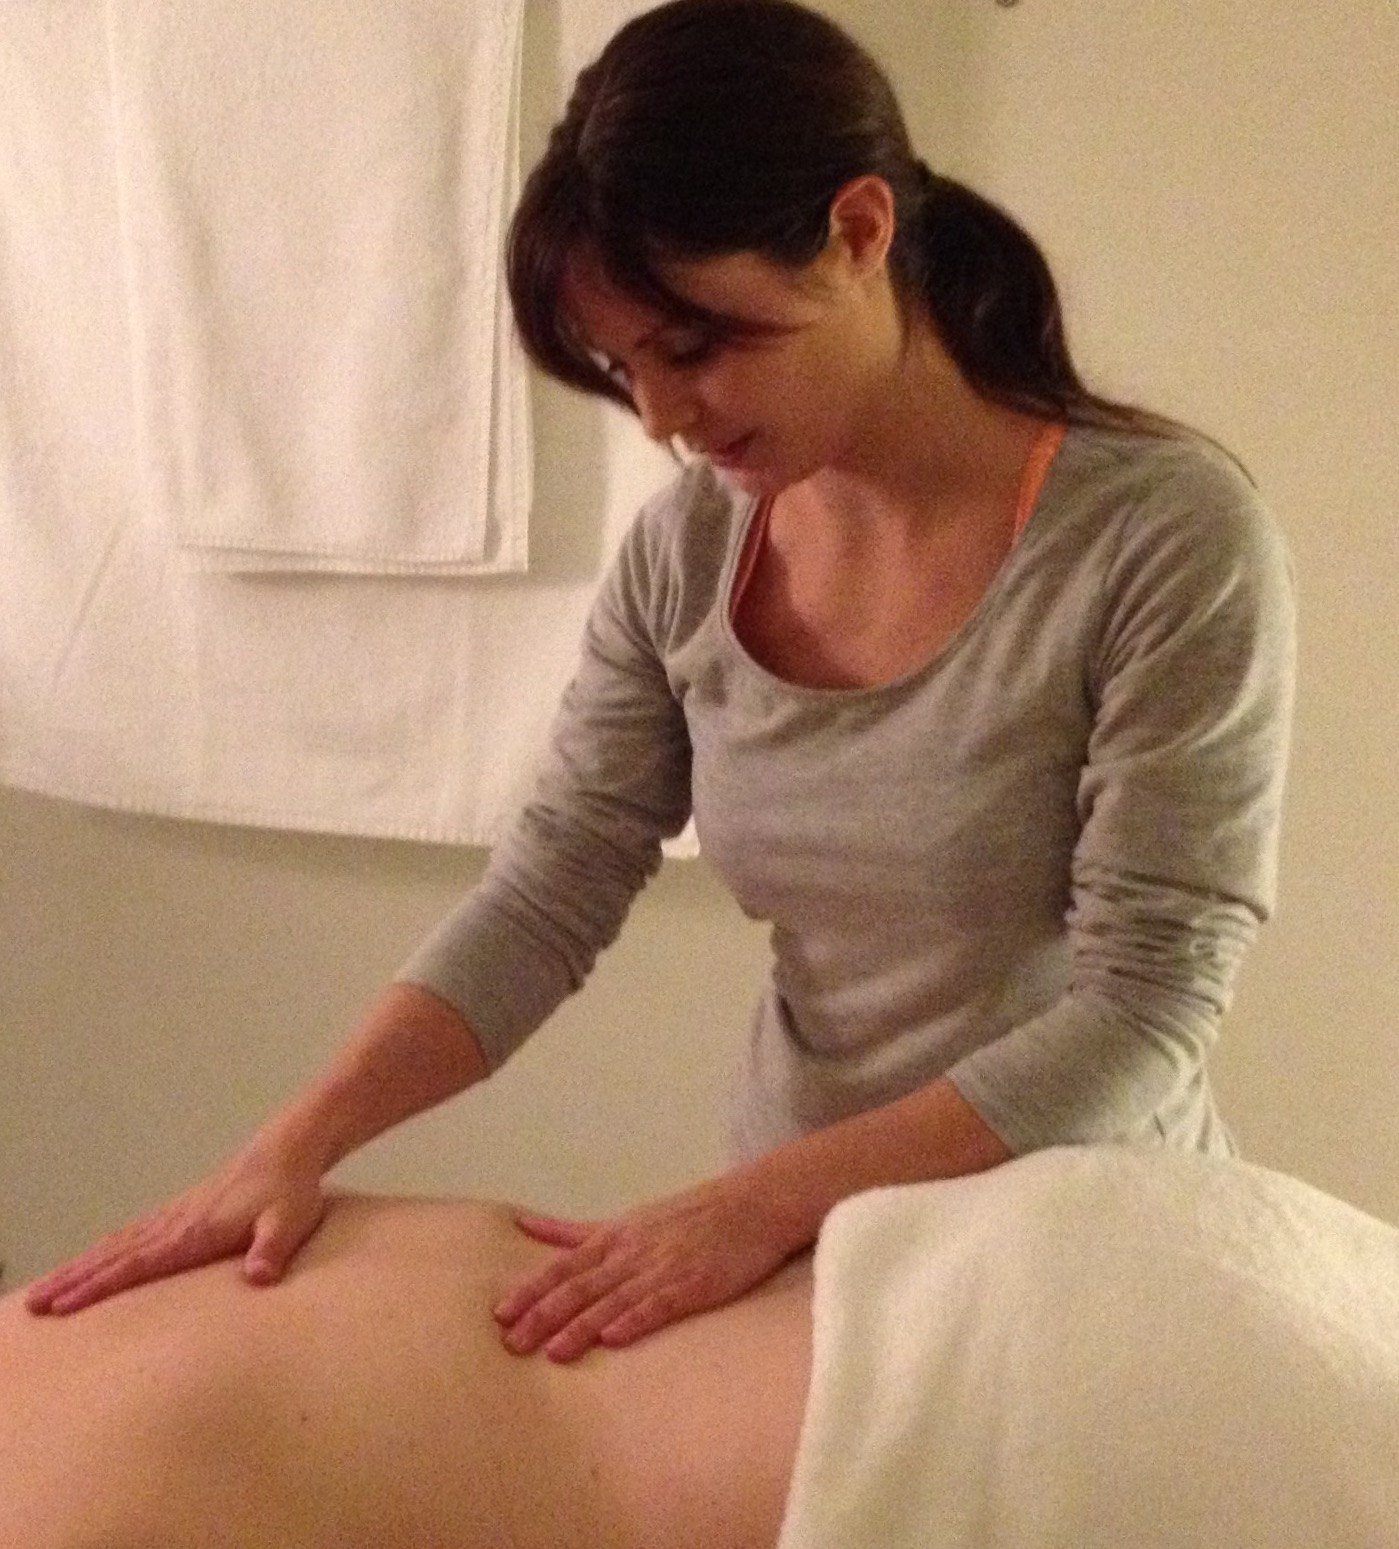 eskort utan kondom skön massage stockholm